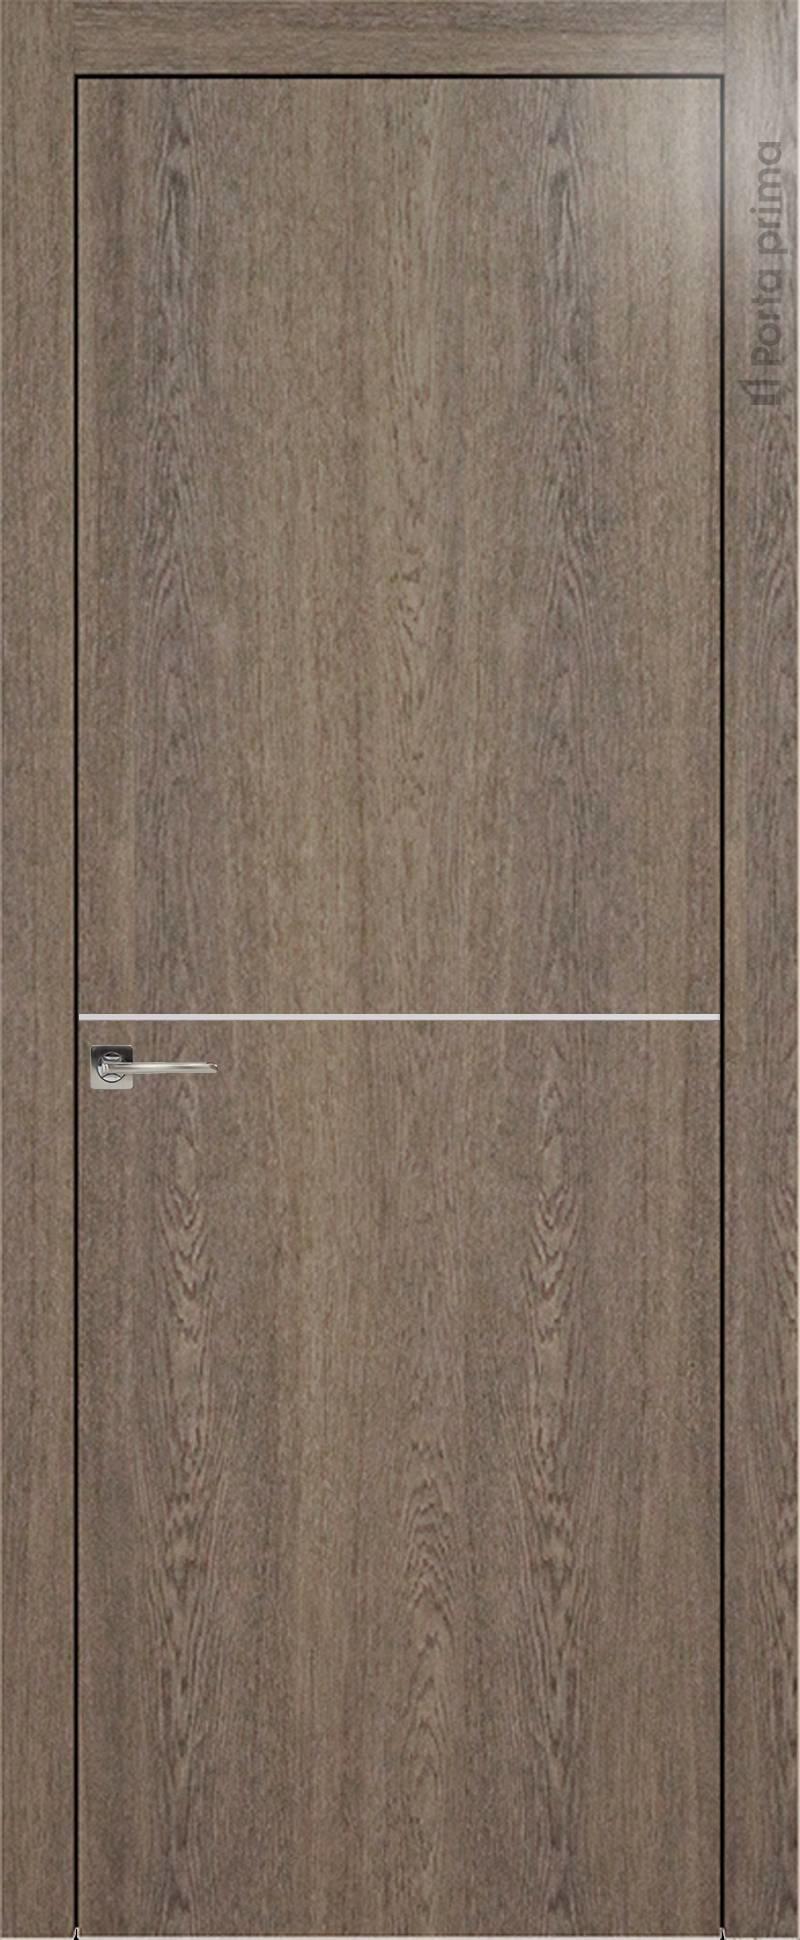 Tivoli Б-3 цвет - Дуб антик Без стекла (ДГ)